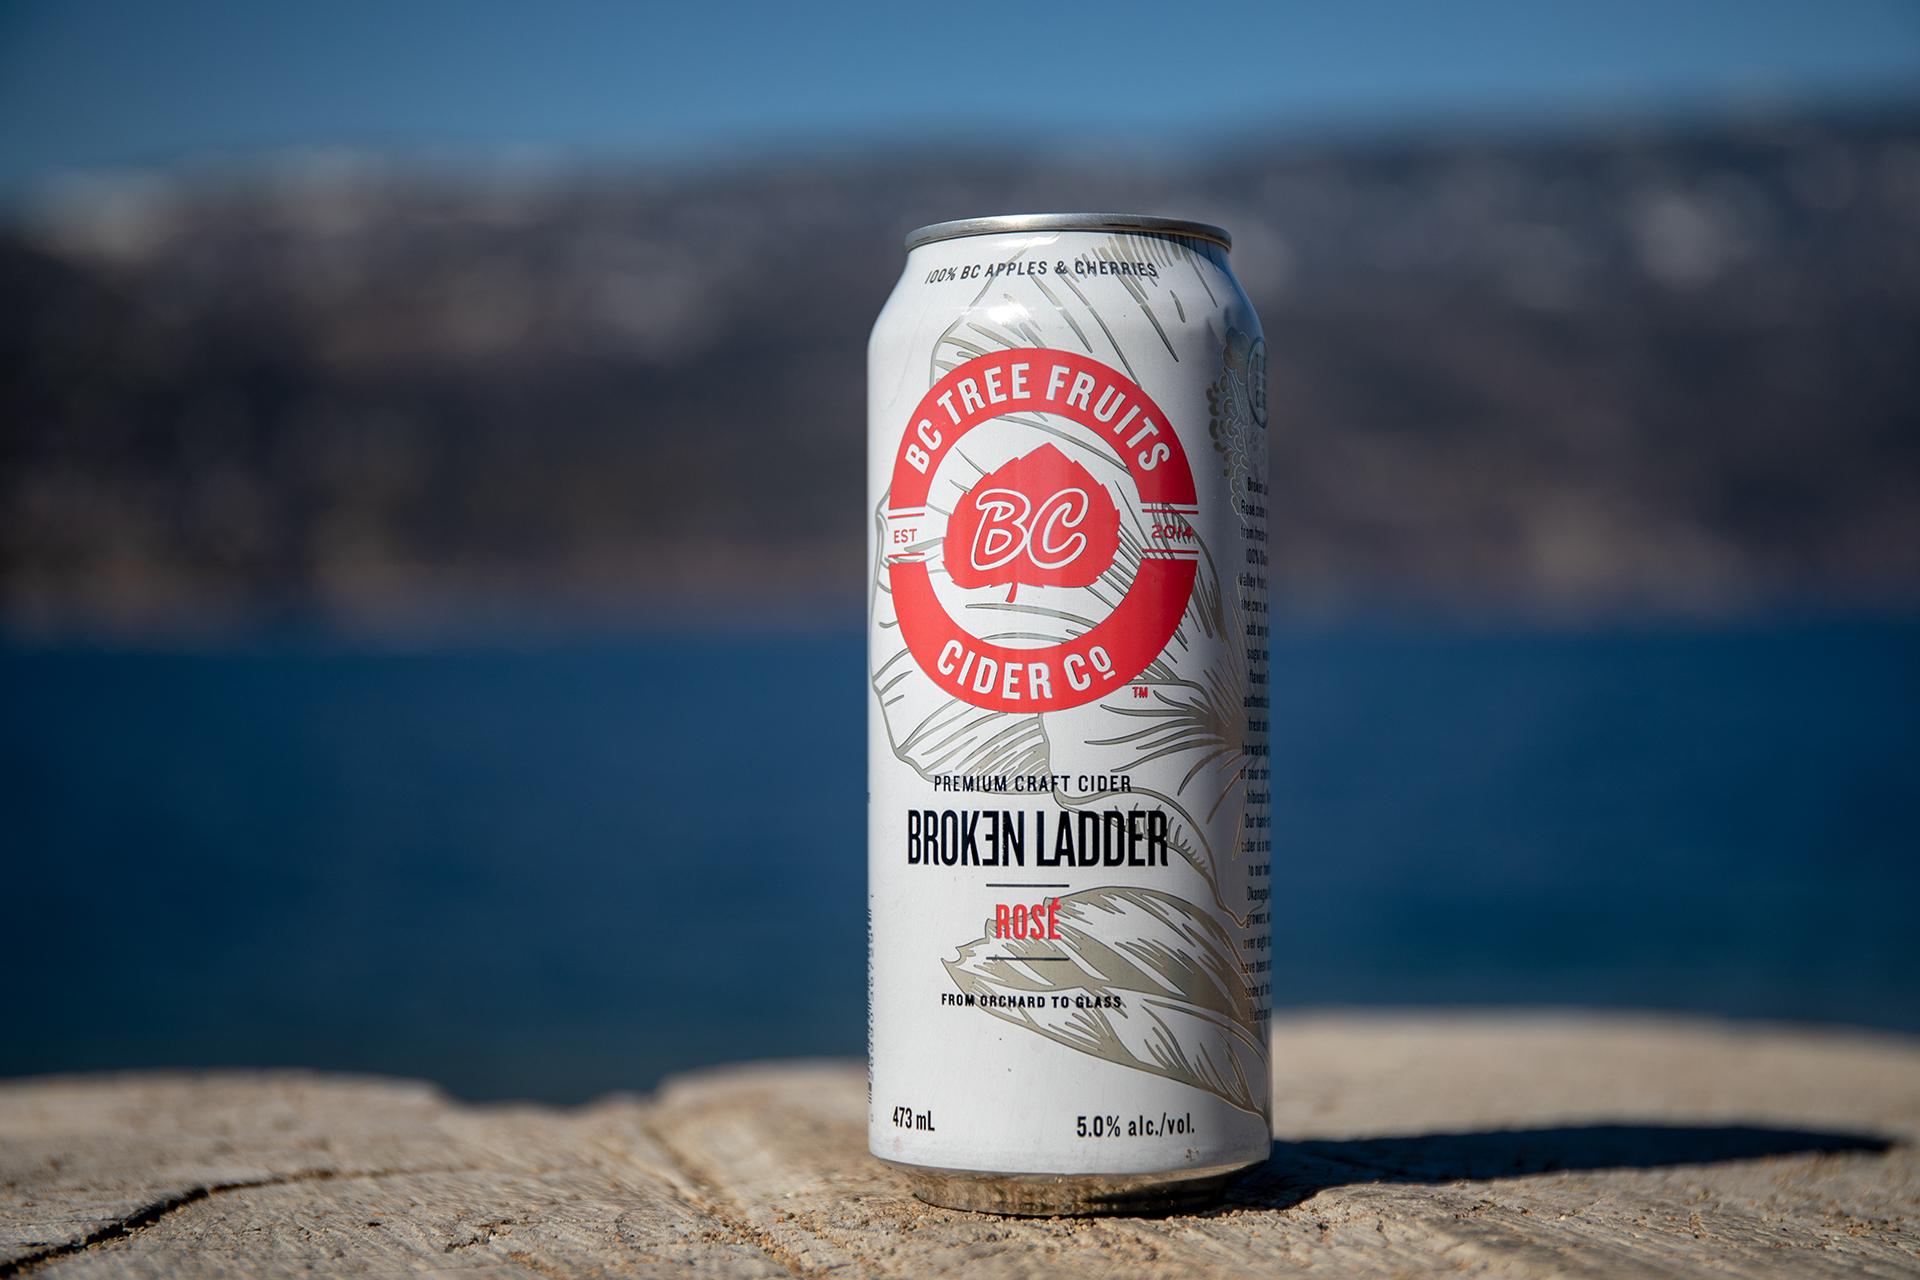 BC Tree Fruits Cider Company Launches Broken Ladder Rose Premium Craft Cider